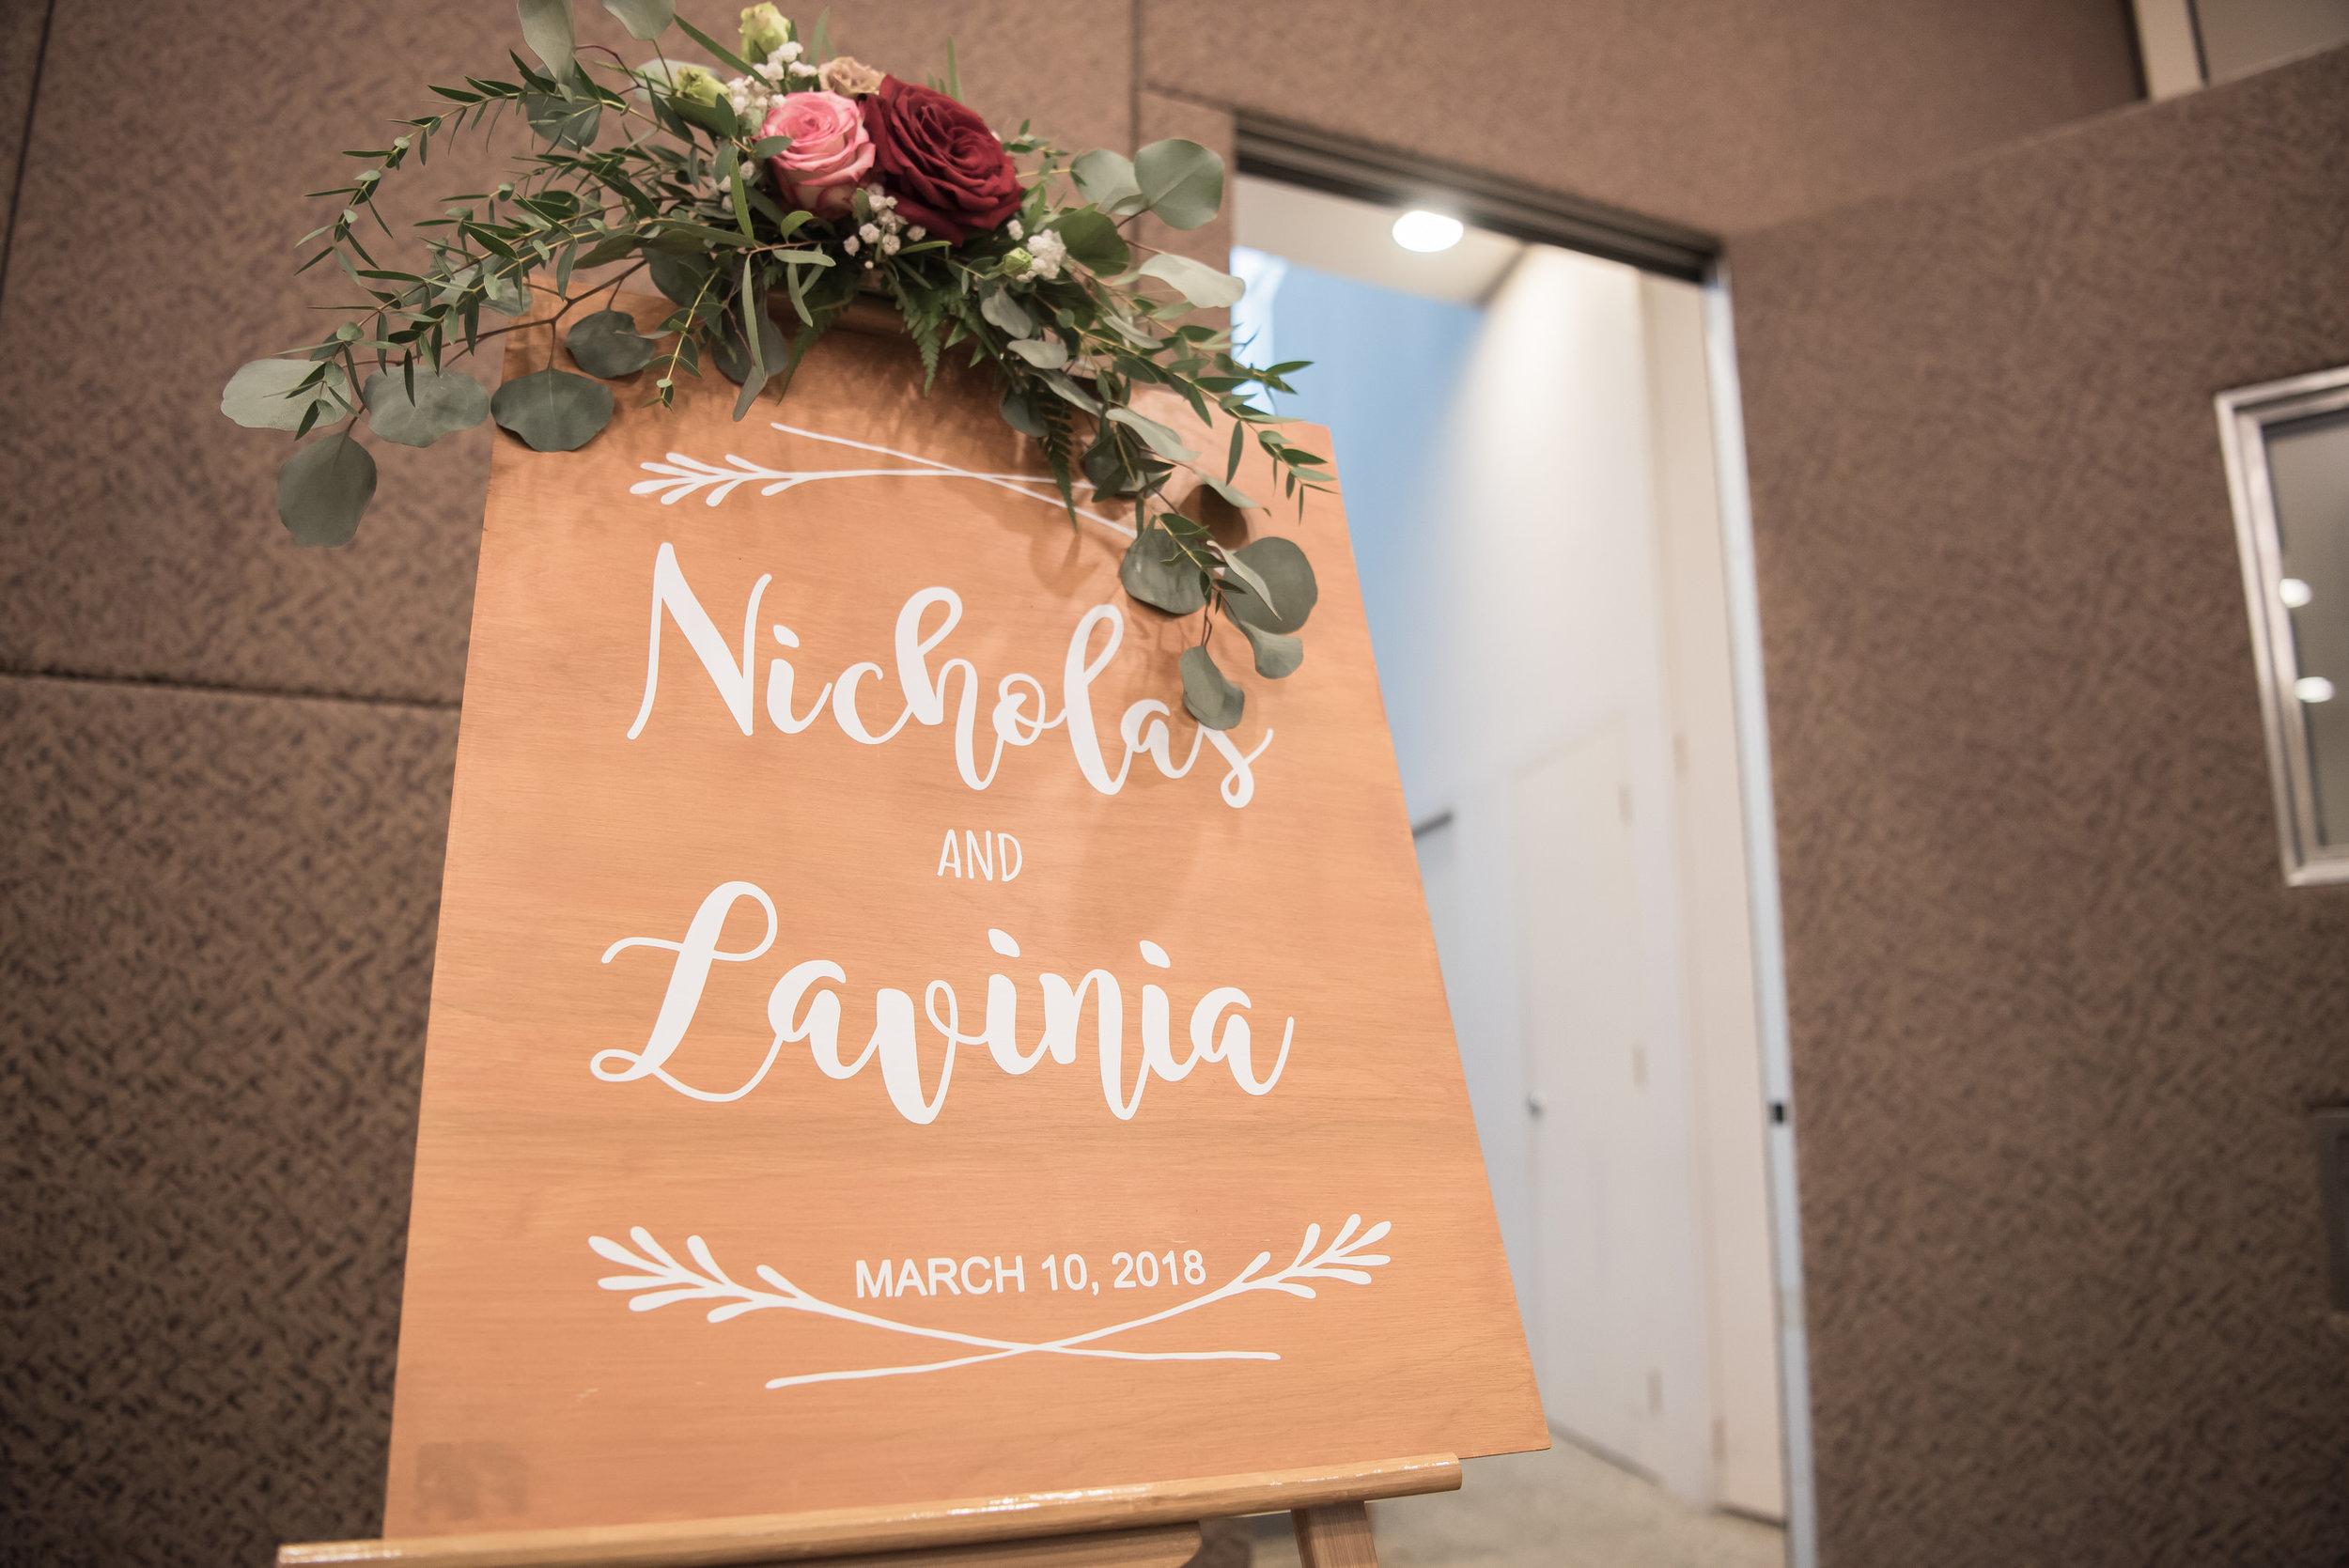 Nicholas&Lavinia-431.jpg